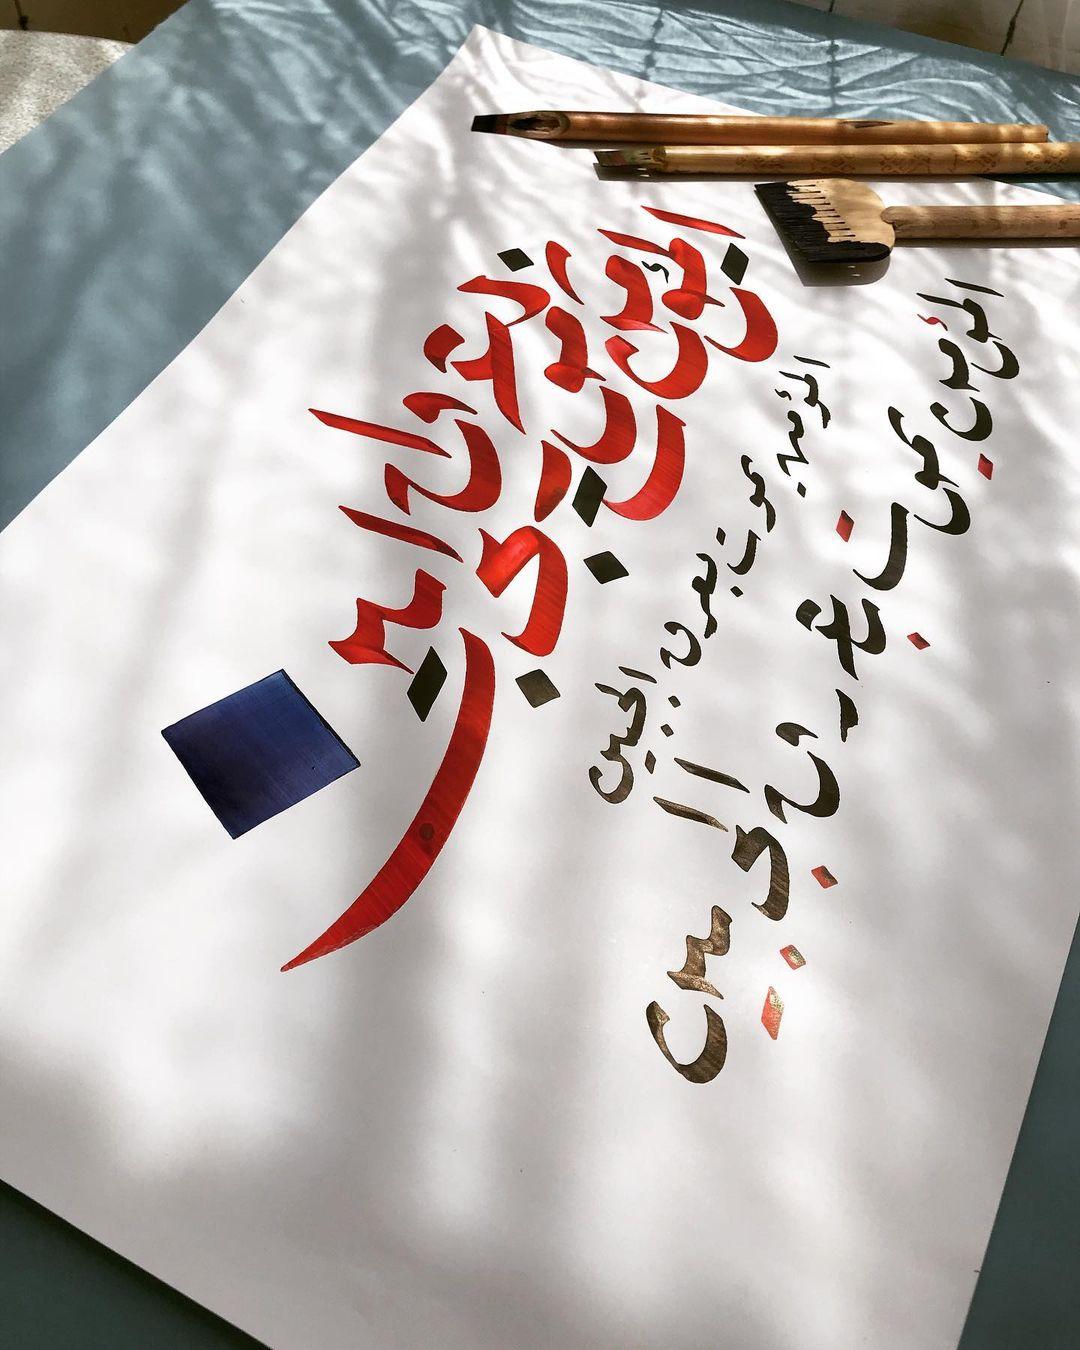 Donwload Photo المؤمن يموت بعرق الجبين #typografi #lettering #hüsnihat #kaligrafi #فن #فنون #خ...- hattat_aa 2